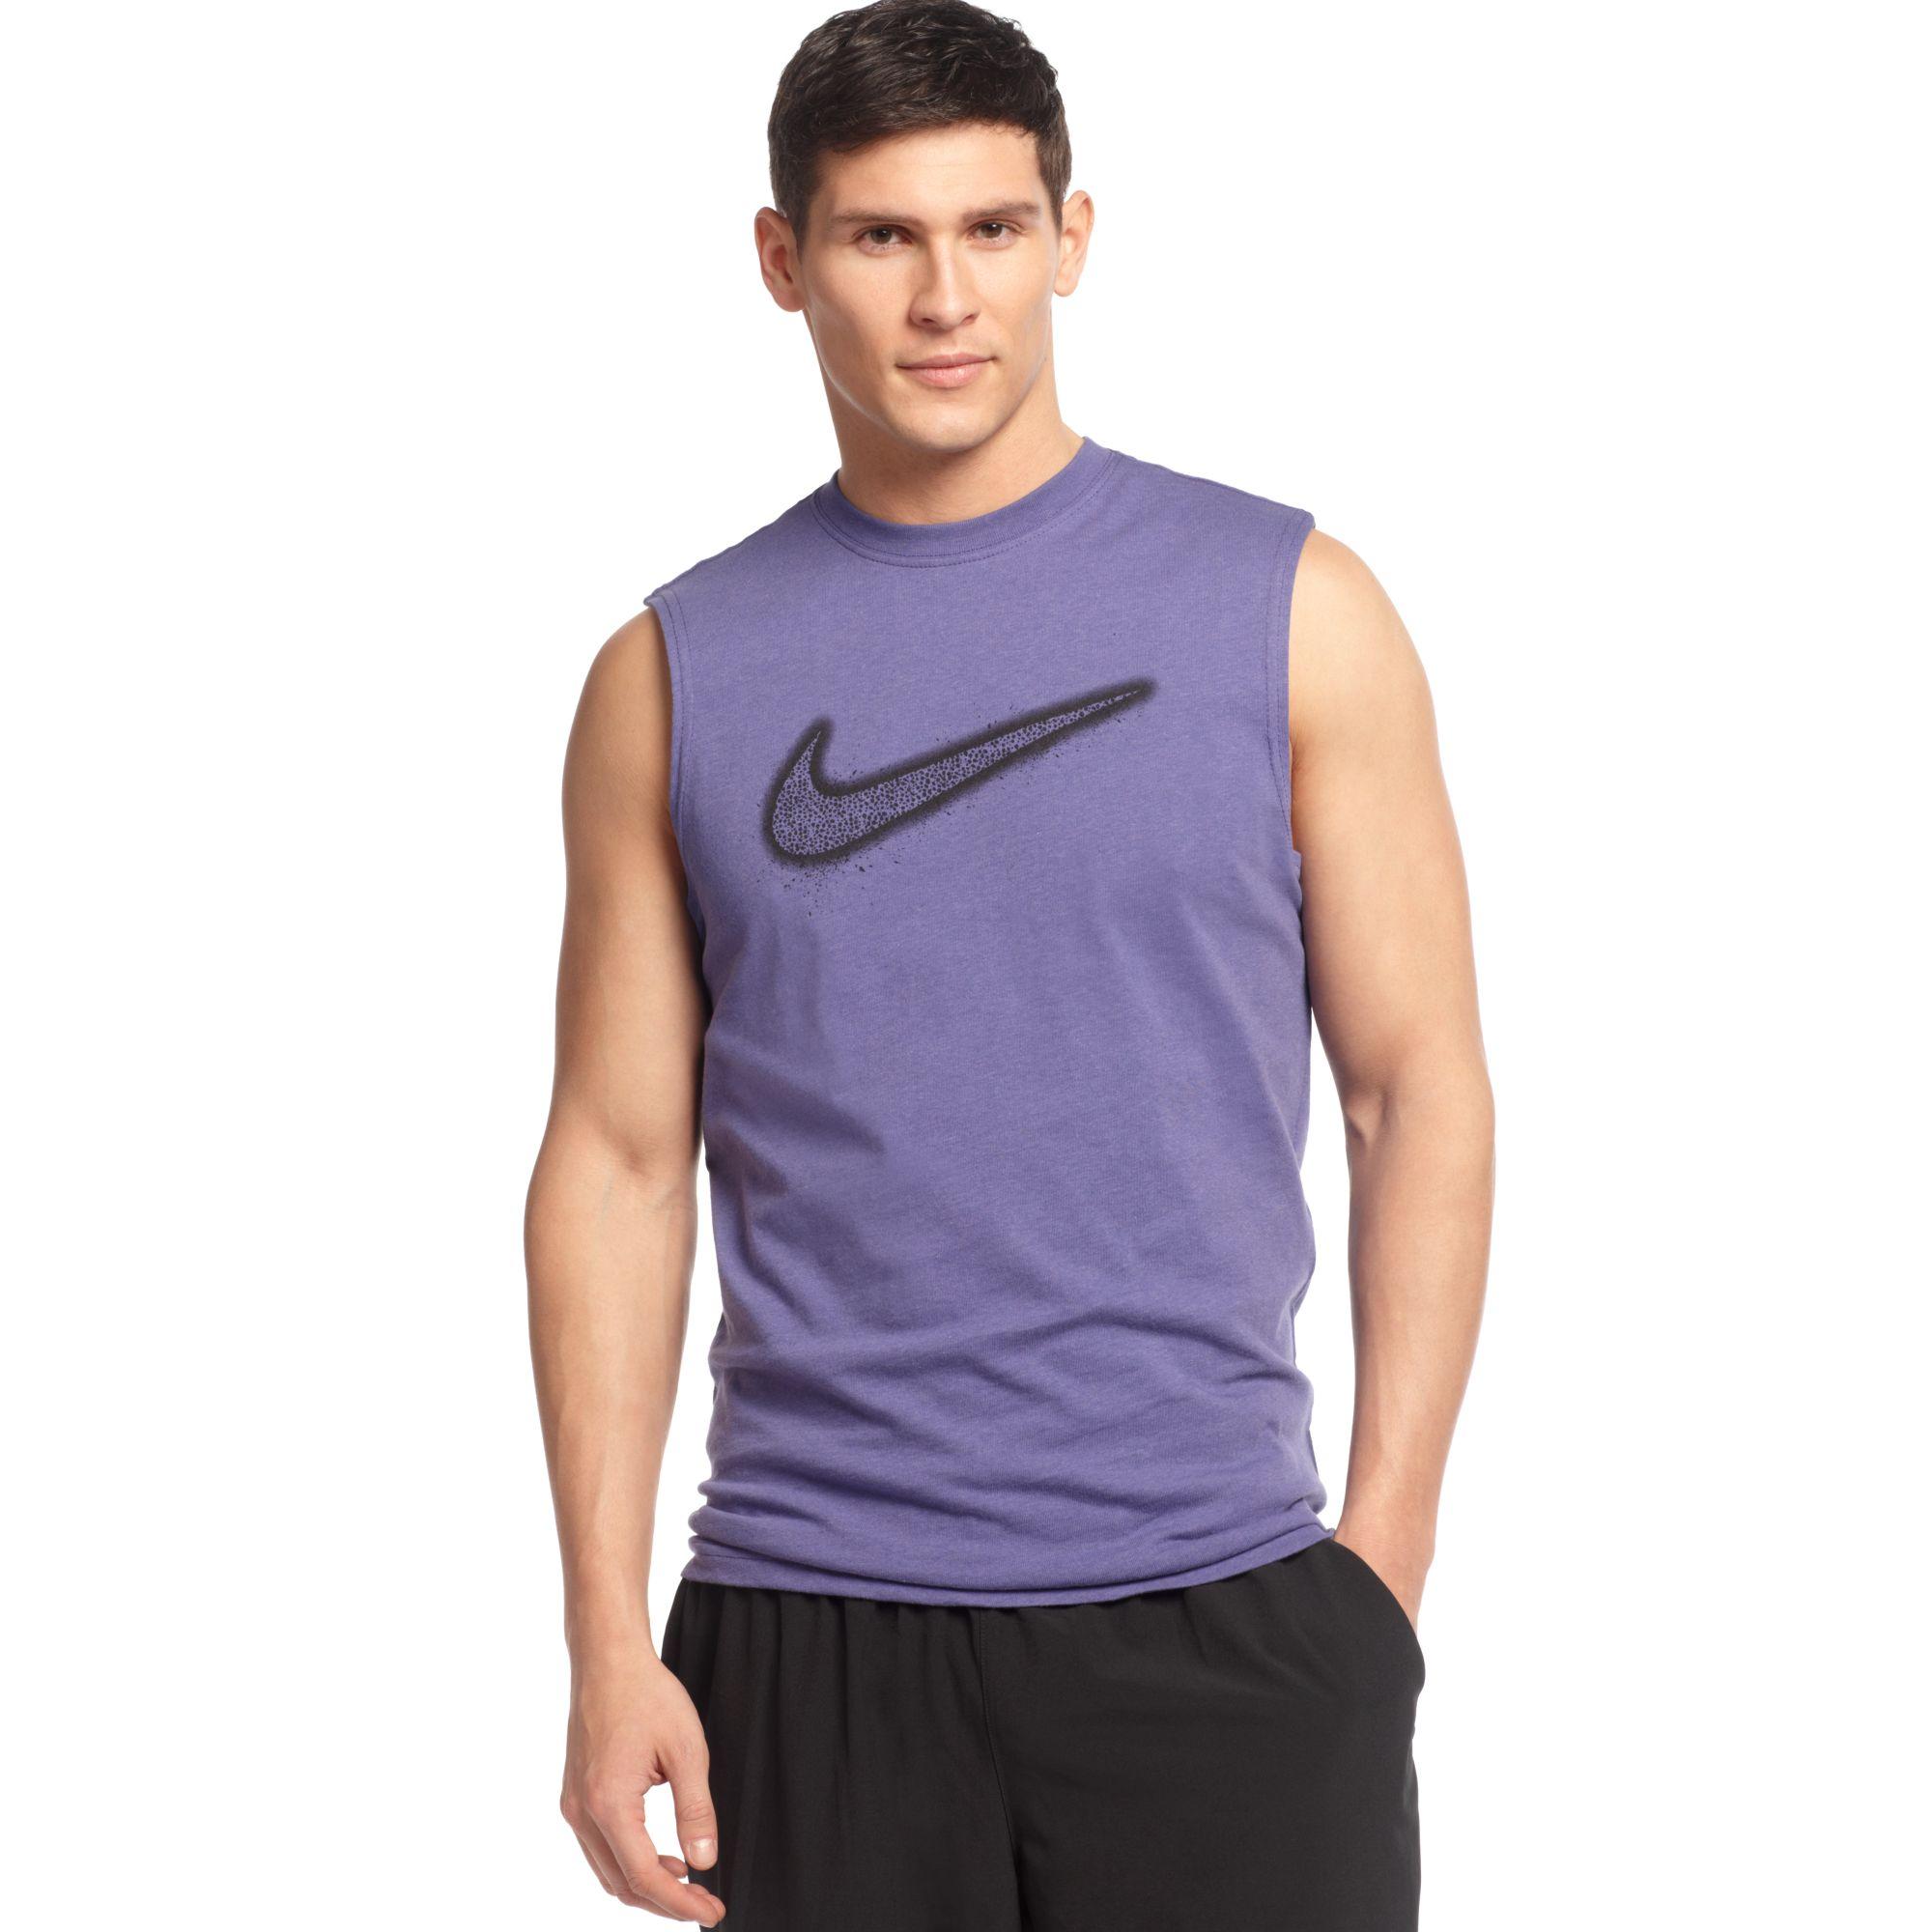 Nike Flight Swoosh Sleeveless T Shirt In Purple For Men Lyst